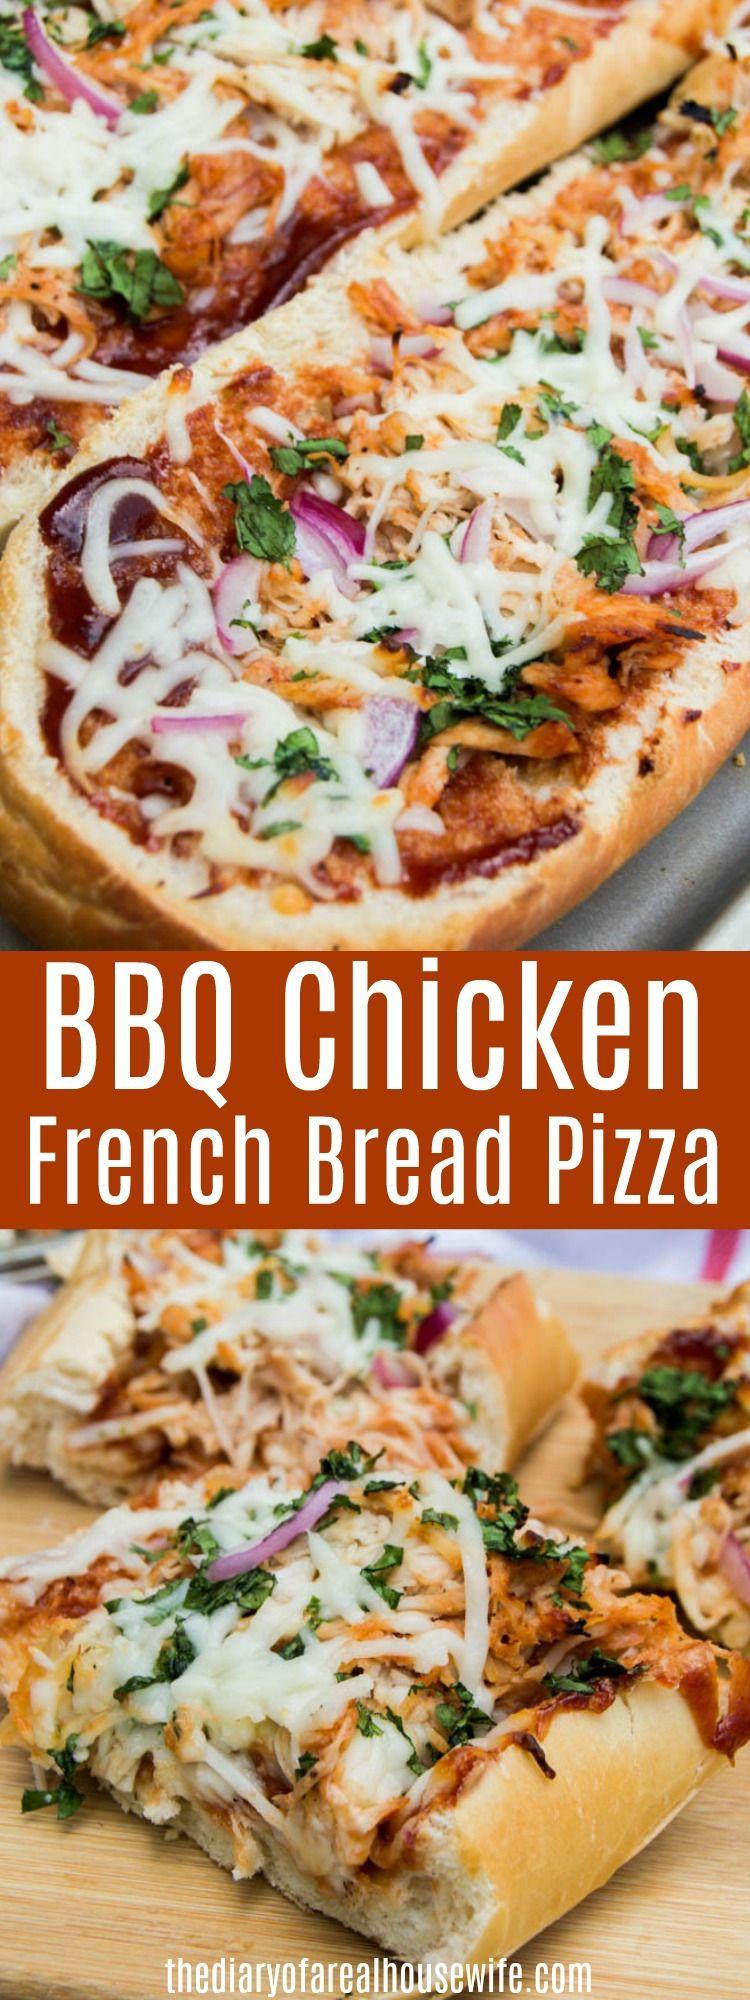 We Love This Simple Dinner Idea Bbq Chicken French Bread Pizza Make The Perfect Pizza Night With The Family Pizz French Bread Pizza Dinner Bread Pizza Bread